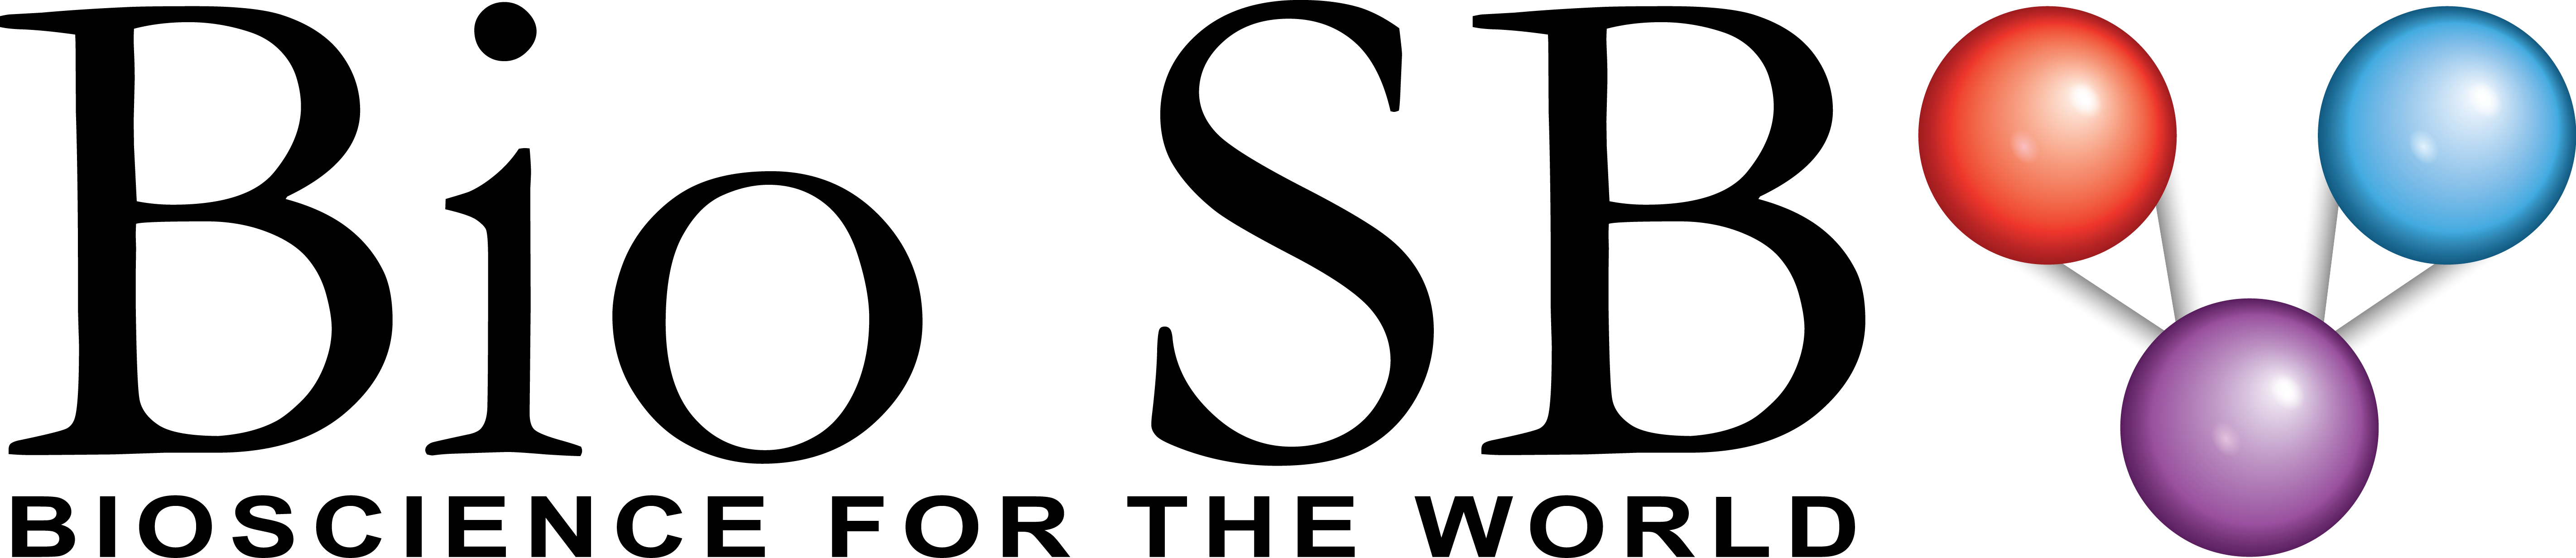 Mission City Fumigation logo